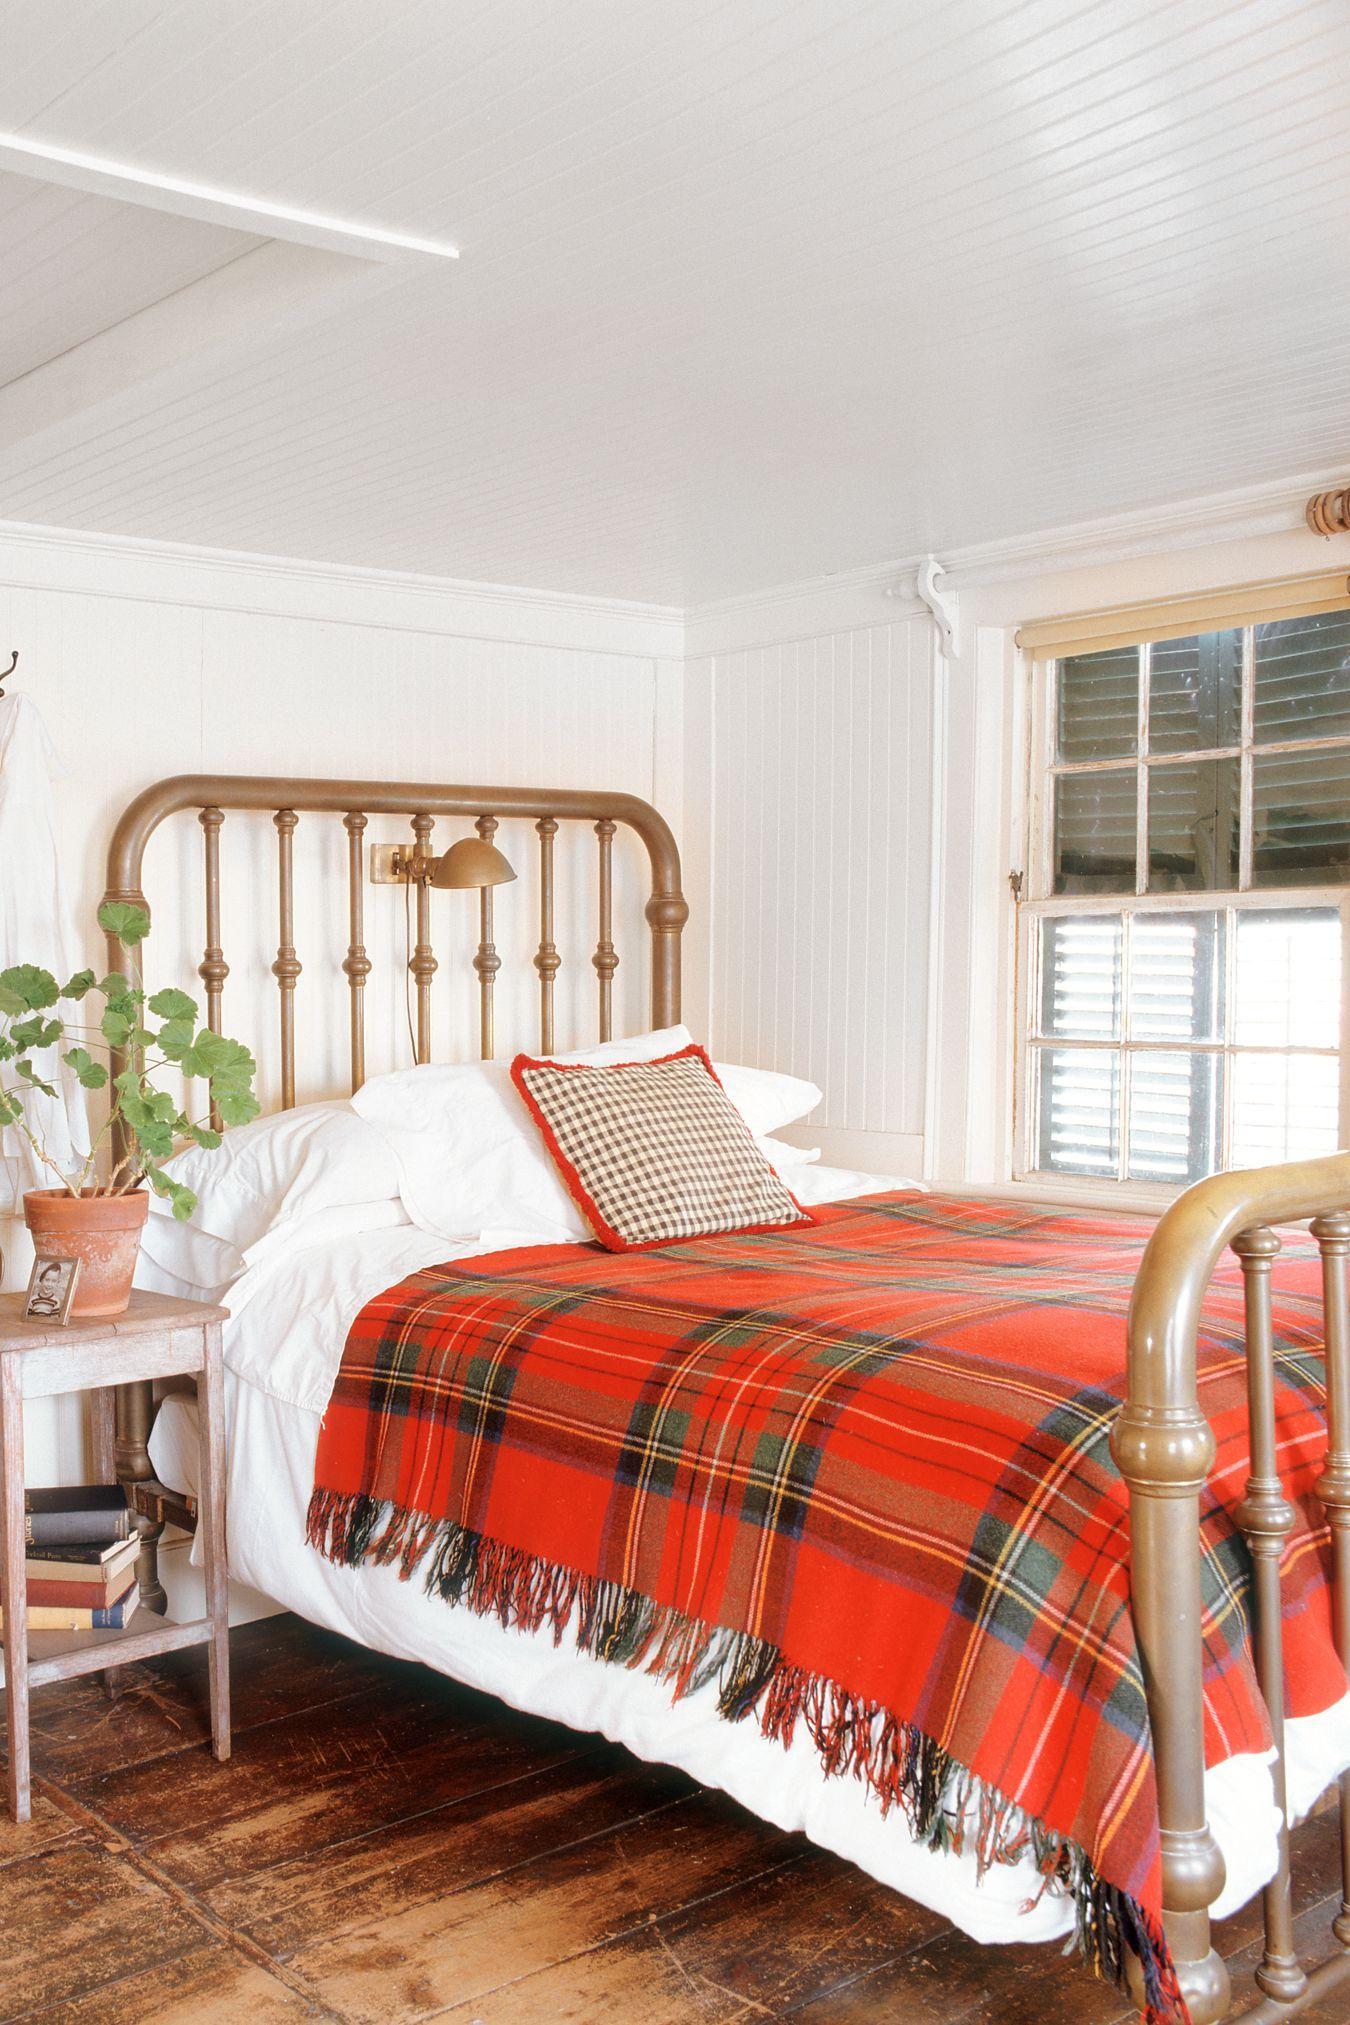 42 cozy bedroom ideas how to make